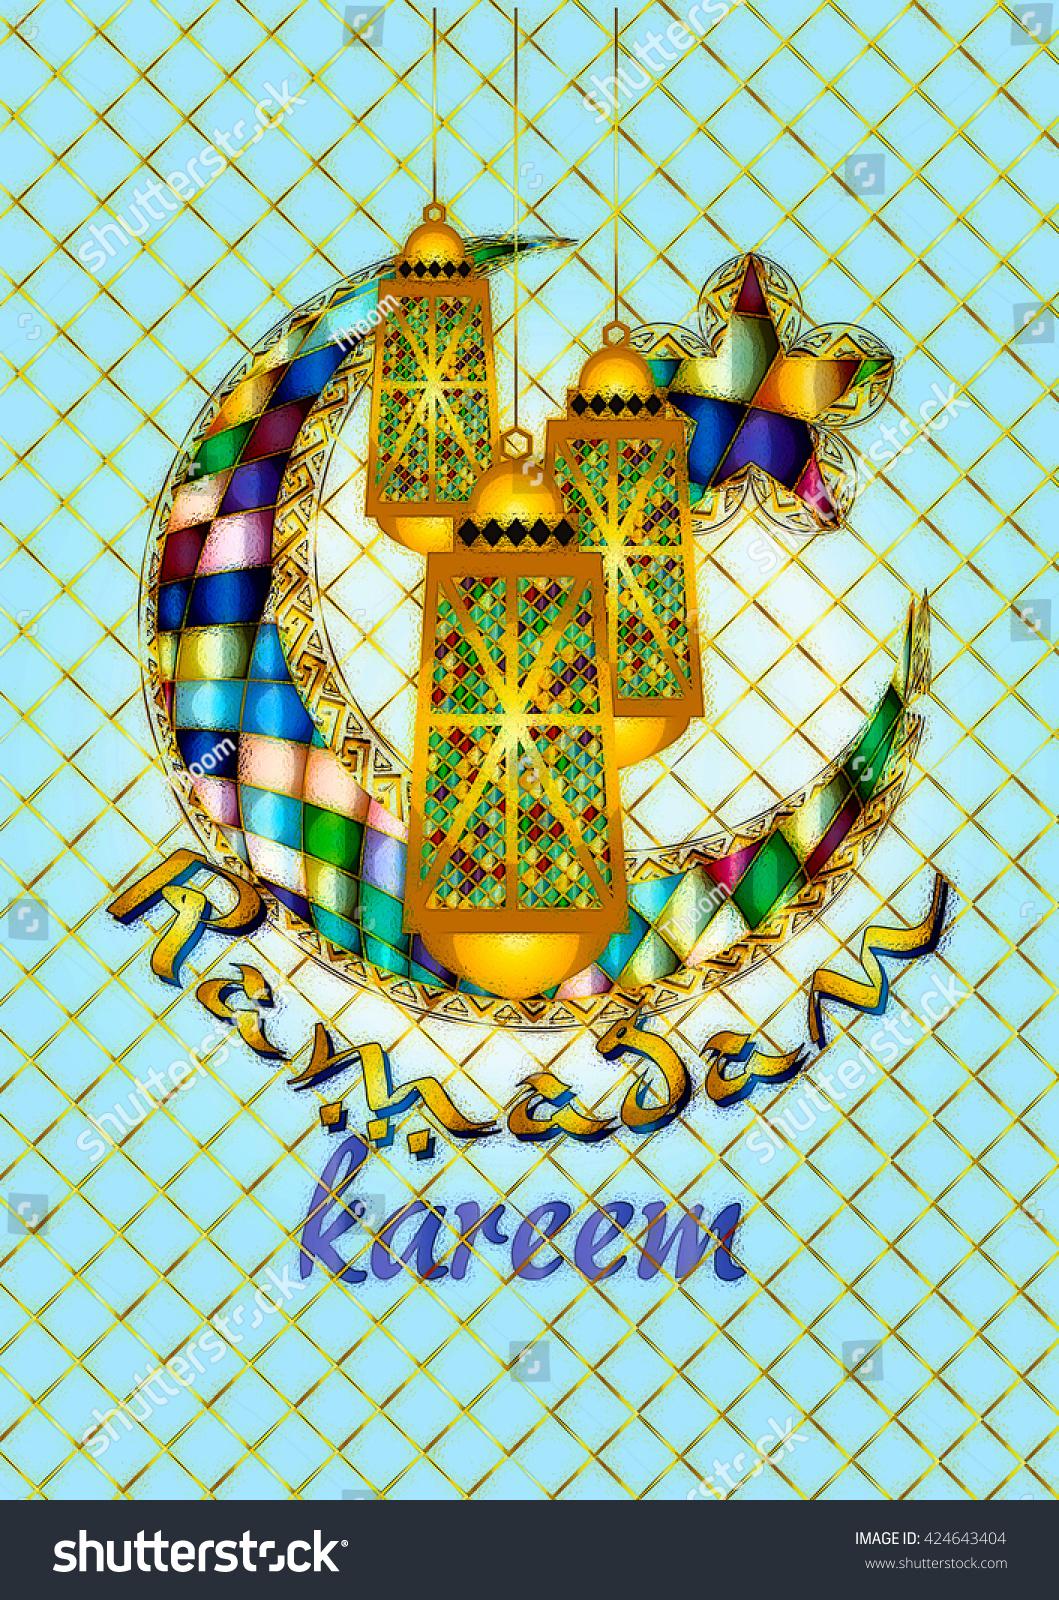 Royalty Free Stock Illustration Of Ramadan Kareem Islamic Muslim